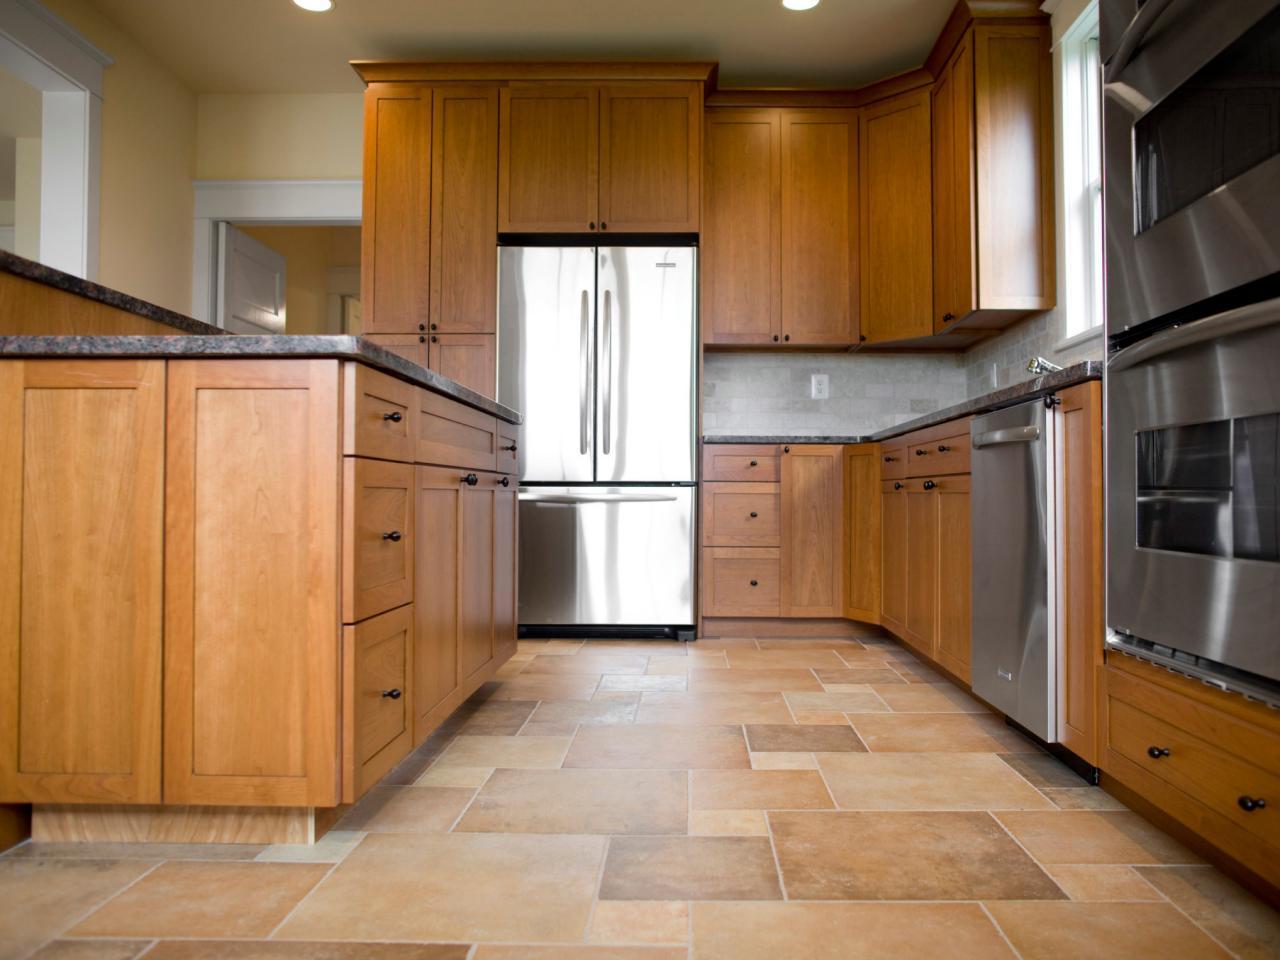 kitchen flooring option related to: kitchen flooring flooring kitchens NGFBJEM